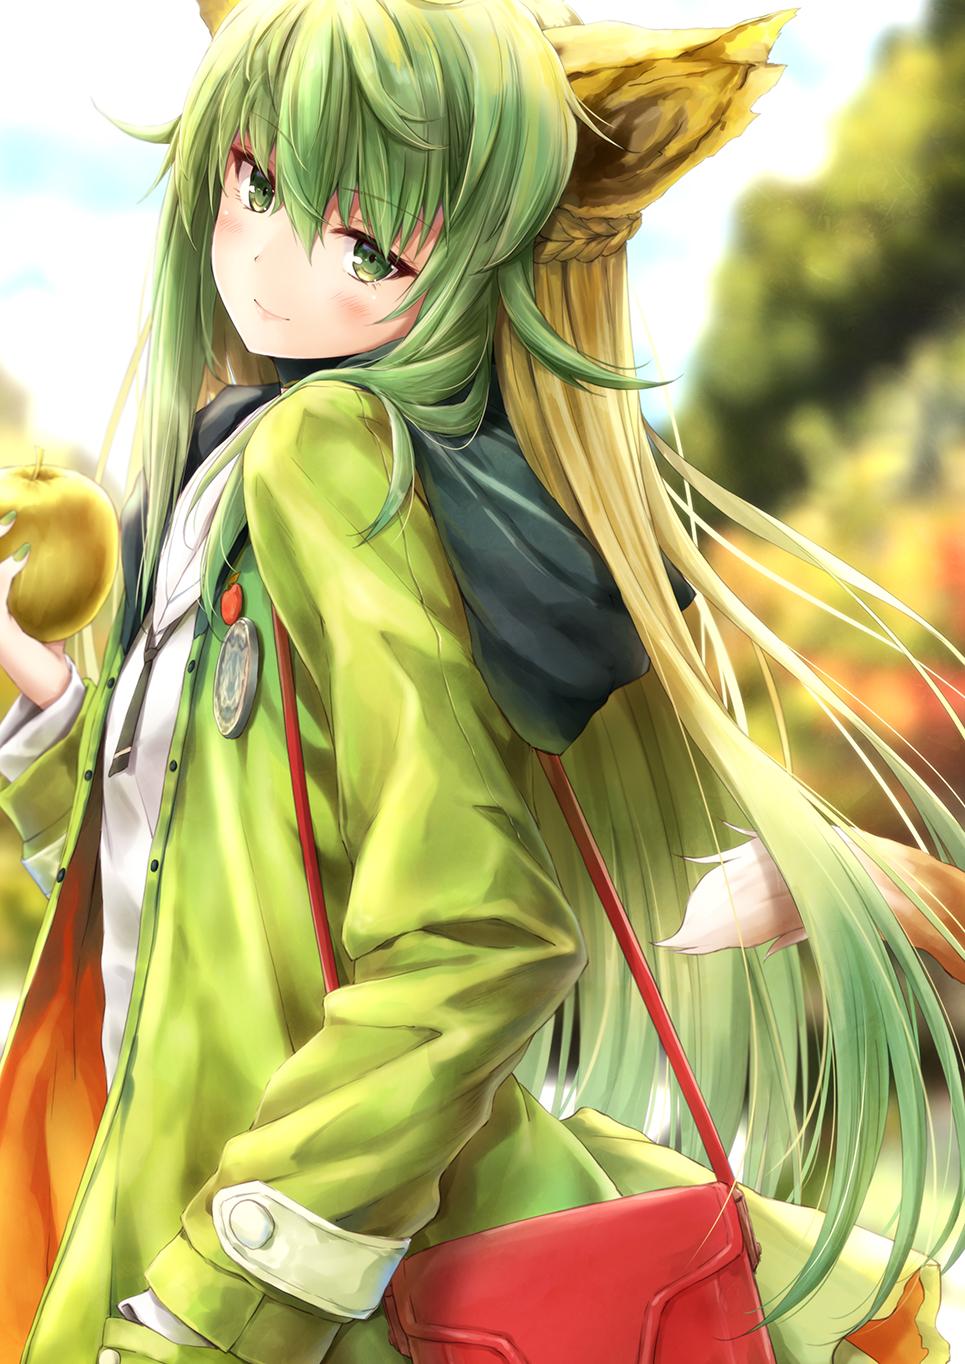 Fate Series Fate Apocrypha Anime Girls Green Hair Animal Ears